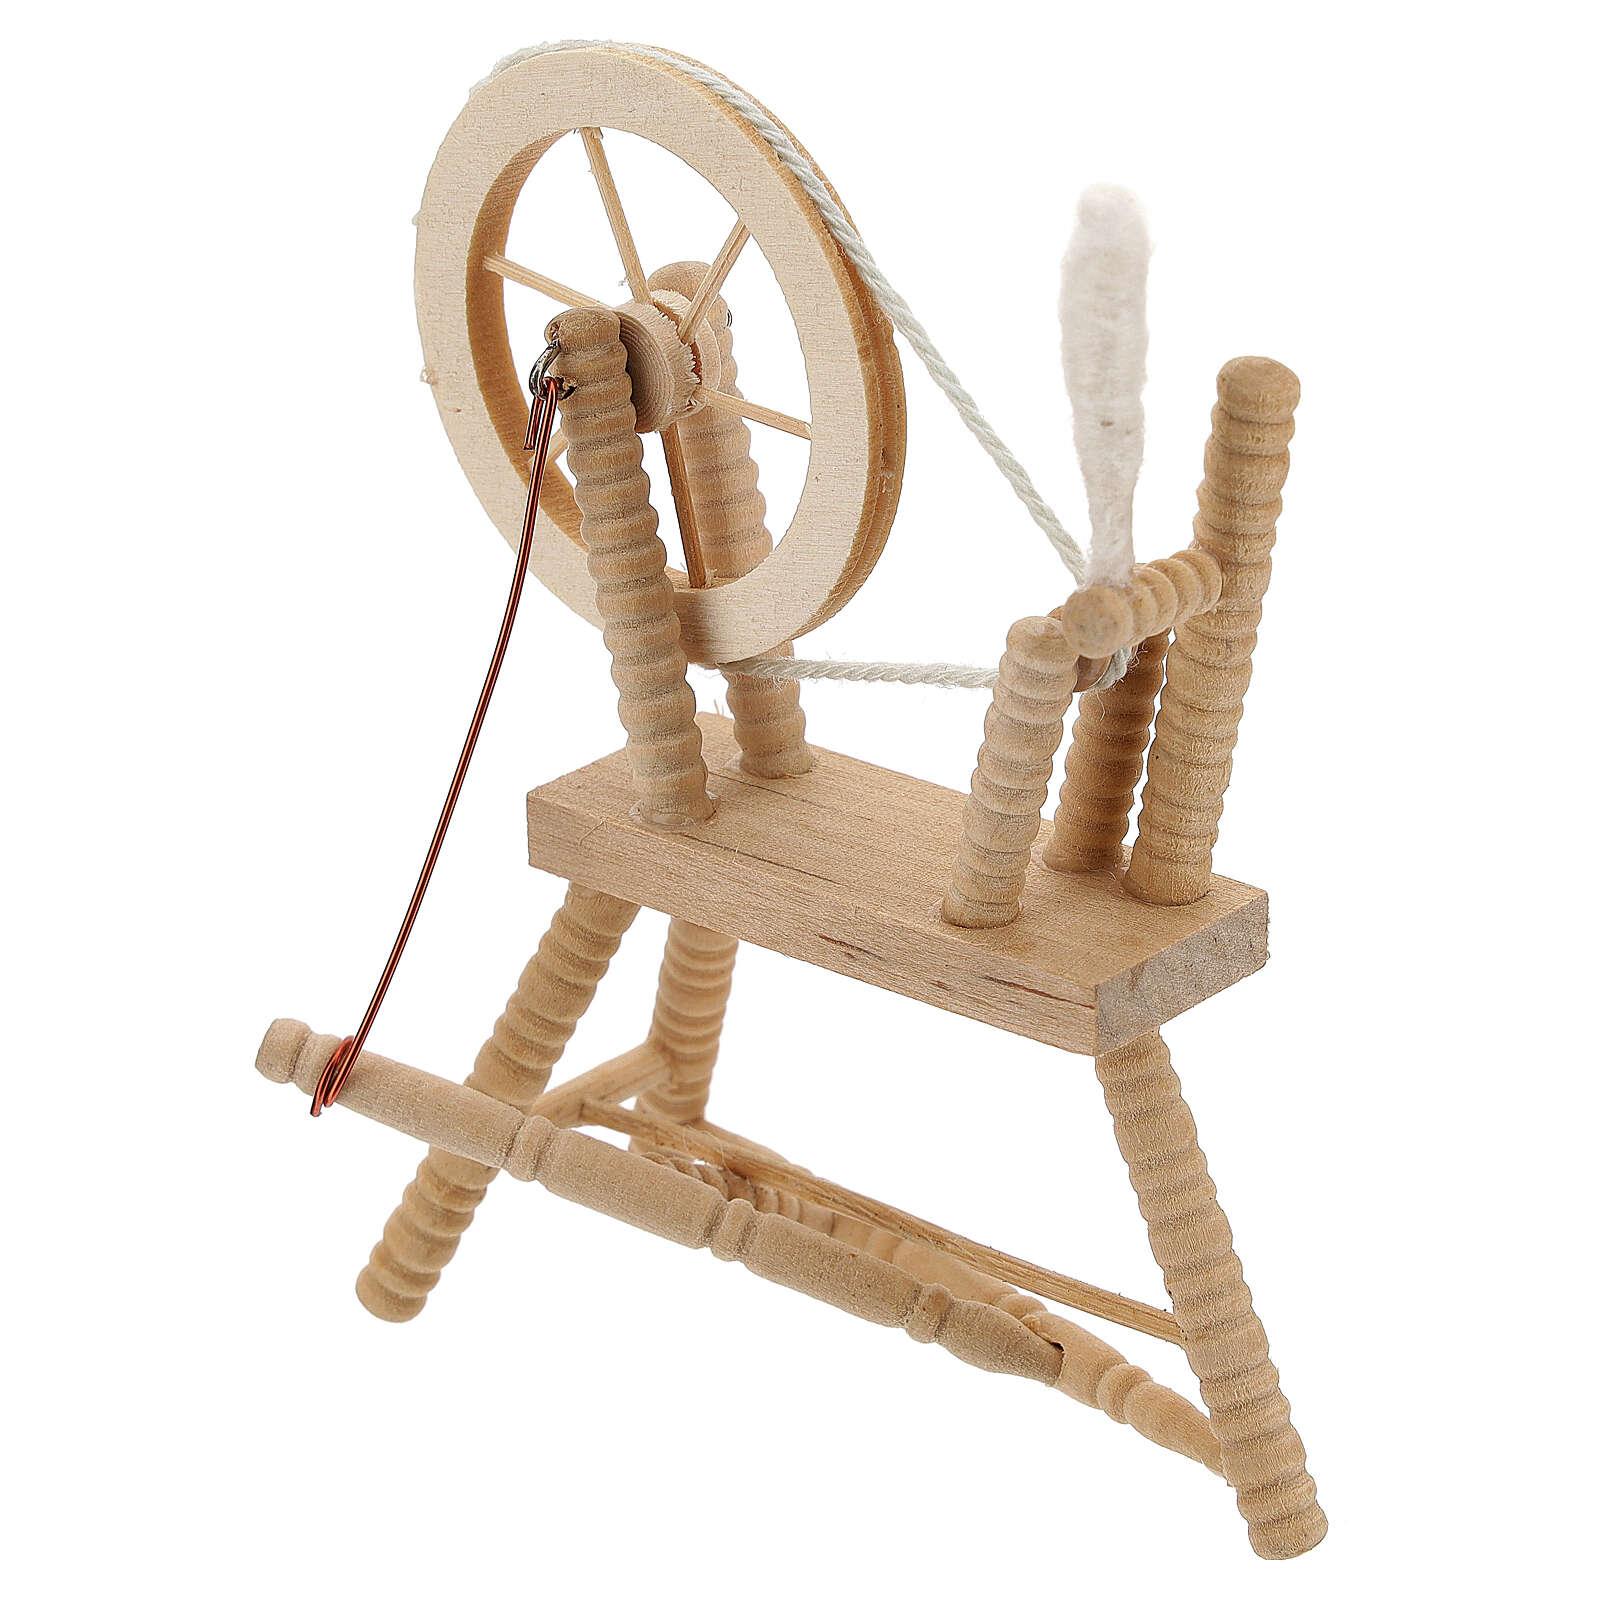 Wool row machine light wood Nativity scene 12 cm 4